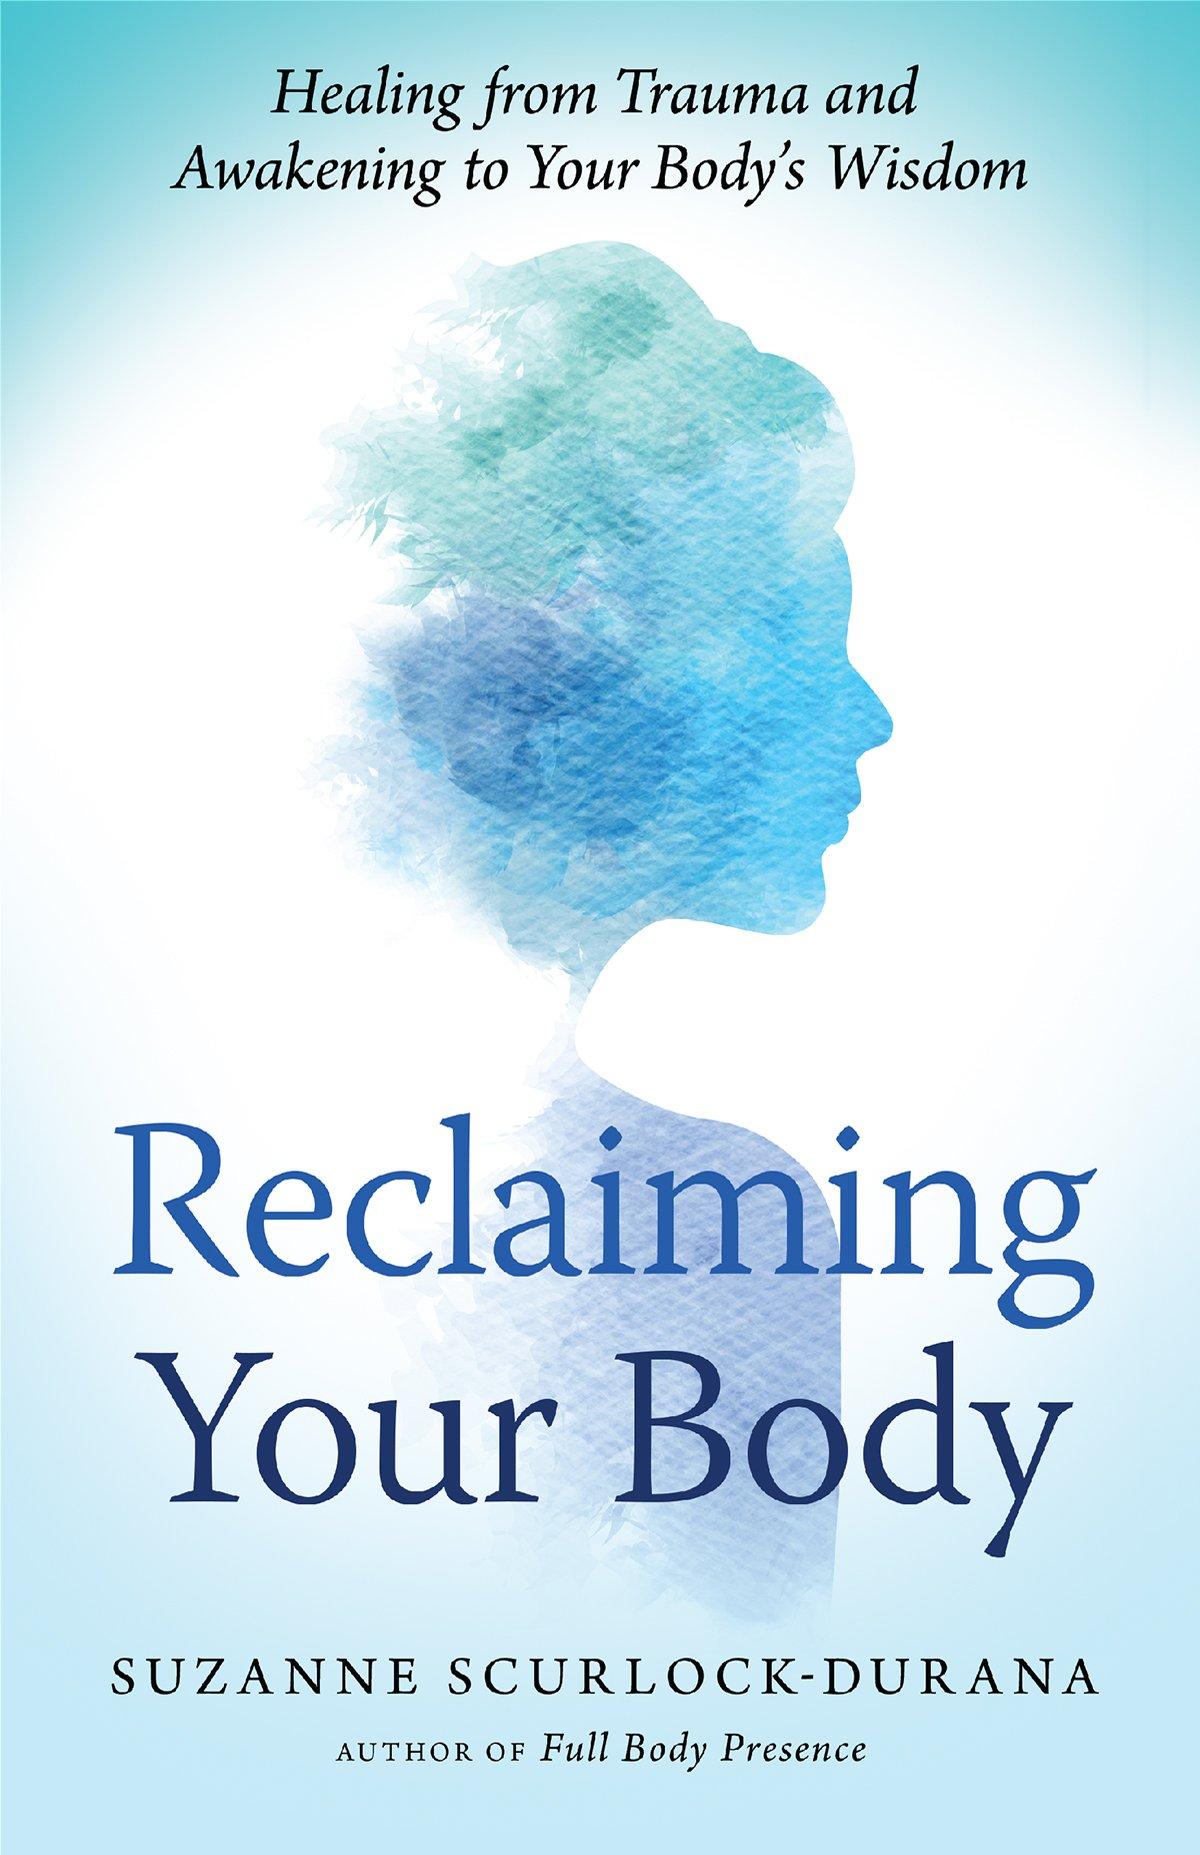 Reclaiming Your Body: Healing from Trauma and Awakening to Your Body's Wisdom pdf